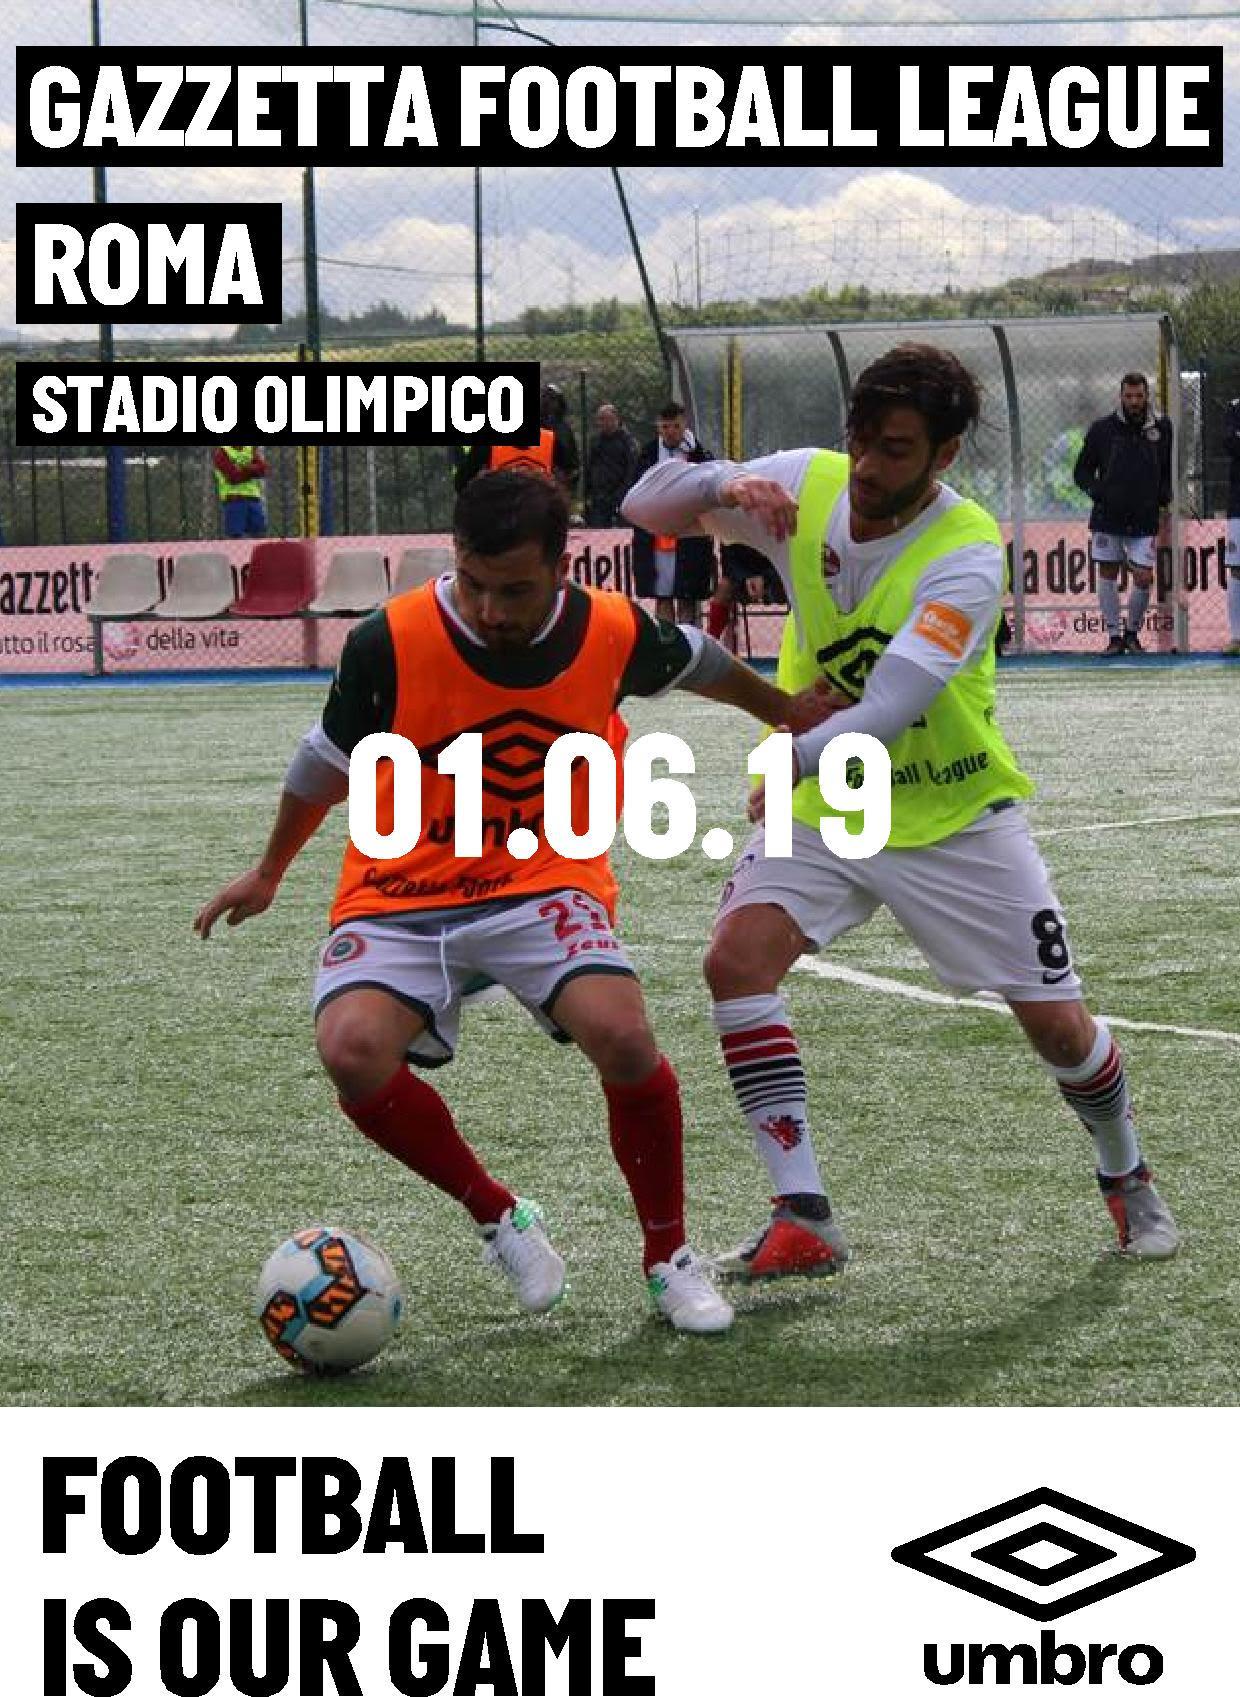 gazzetta football league finale roma 2